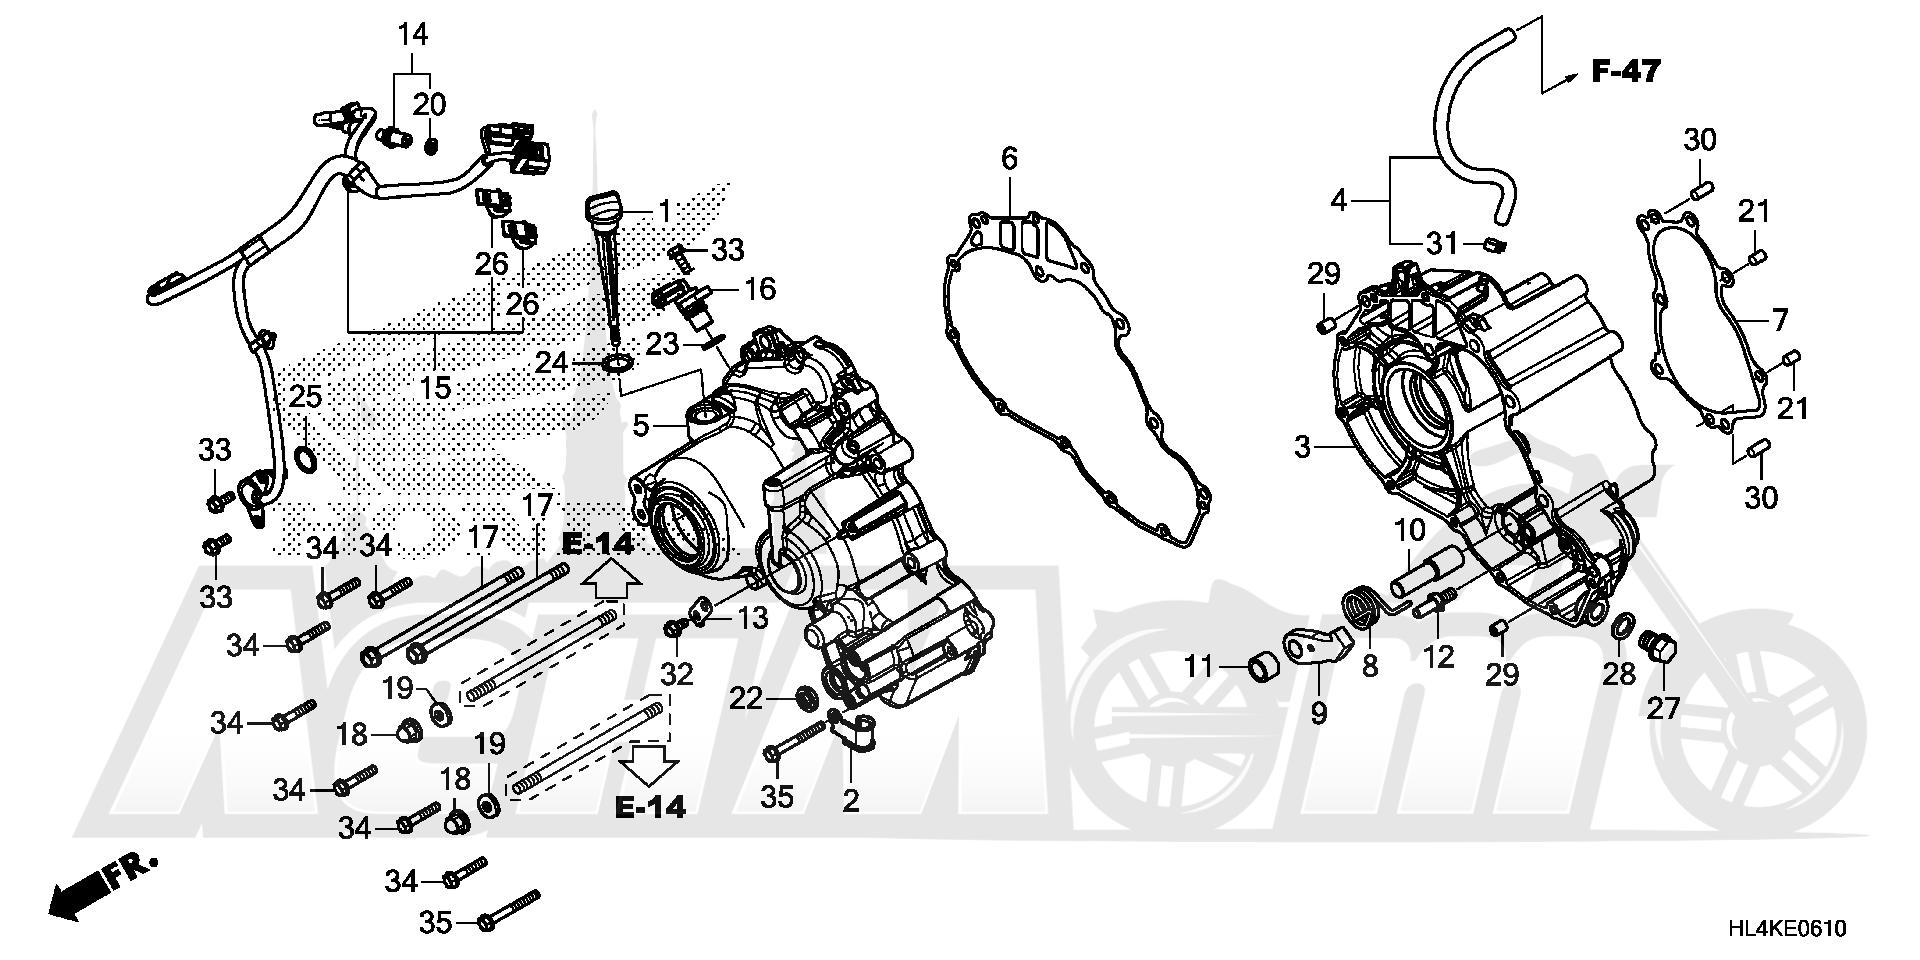 Запчасти для Квадроцикла Honda 2019 SXS1000M5P Раздел: SUB-TRANSMISSION CASE   SUB трансмиссия корпус